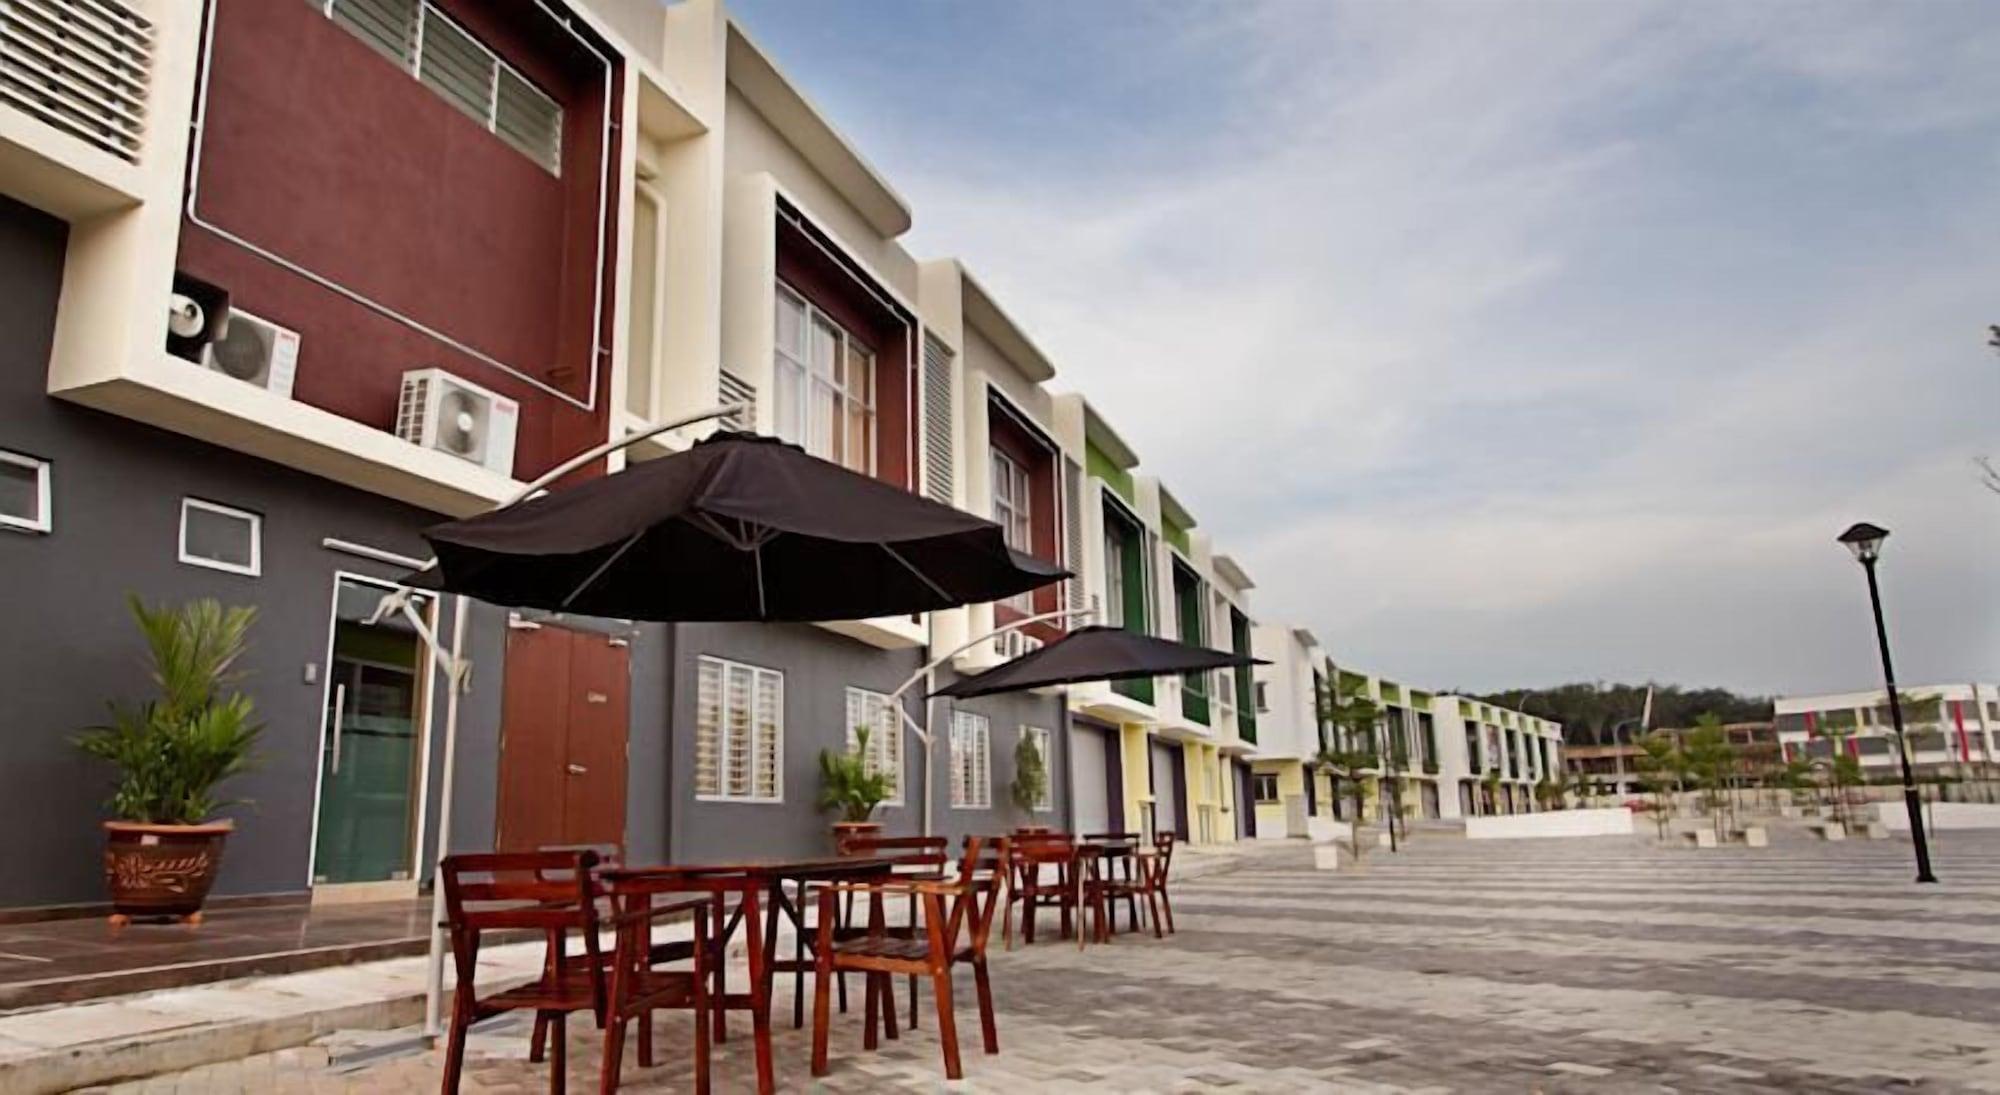 Sri Enstek Hotel, Seremban